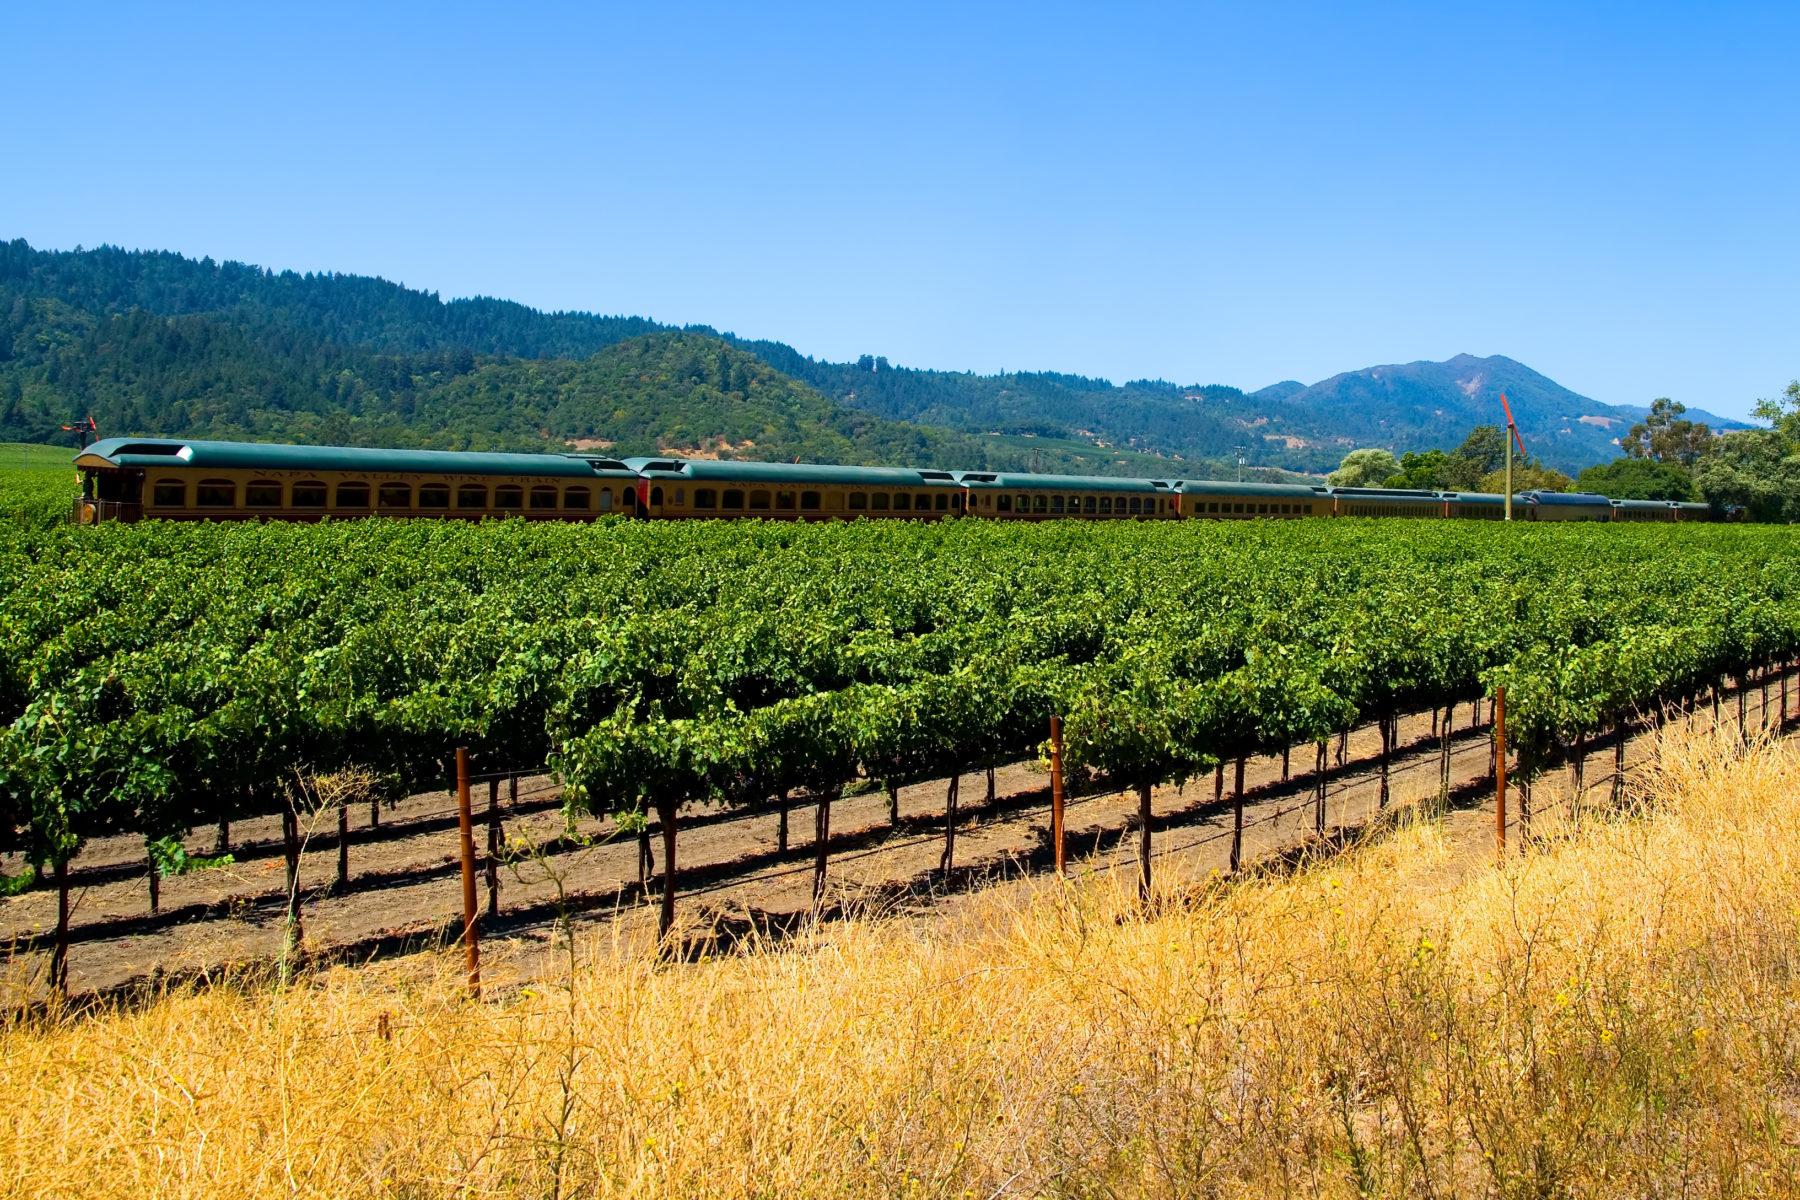 Napa Valley Wine Train cruising through lush vineyards